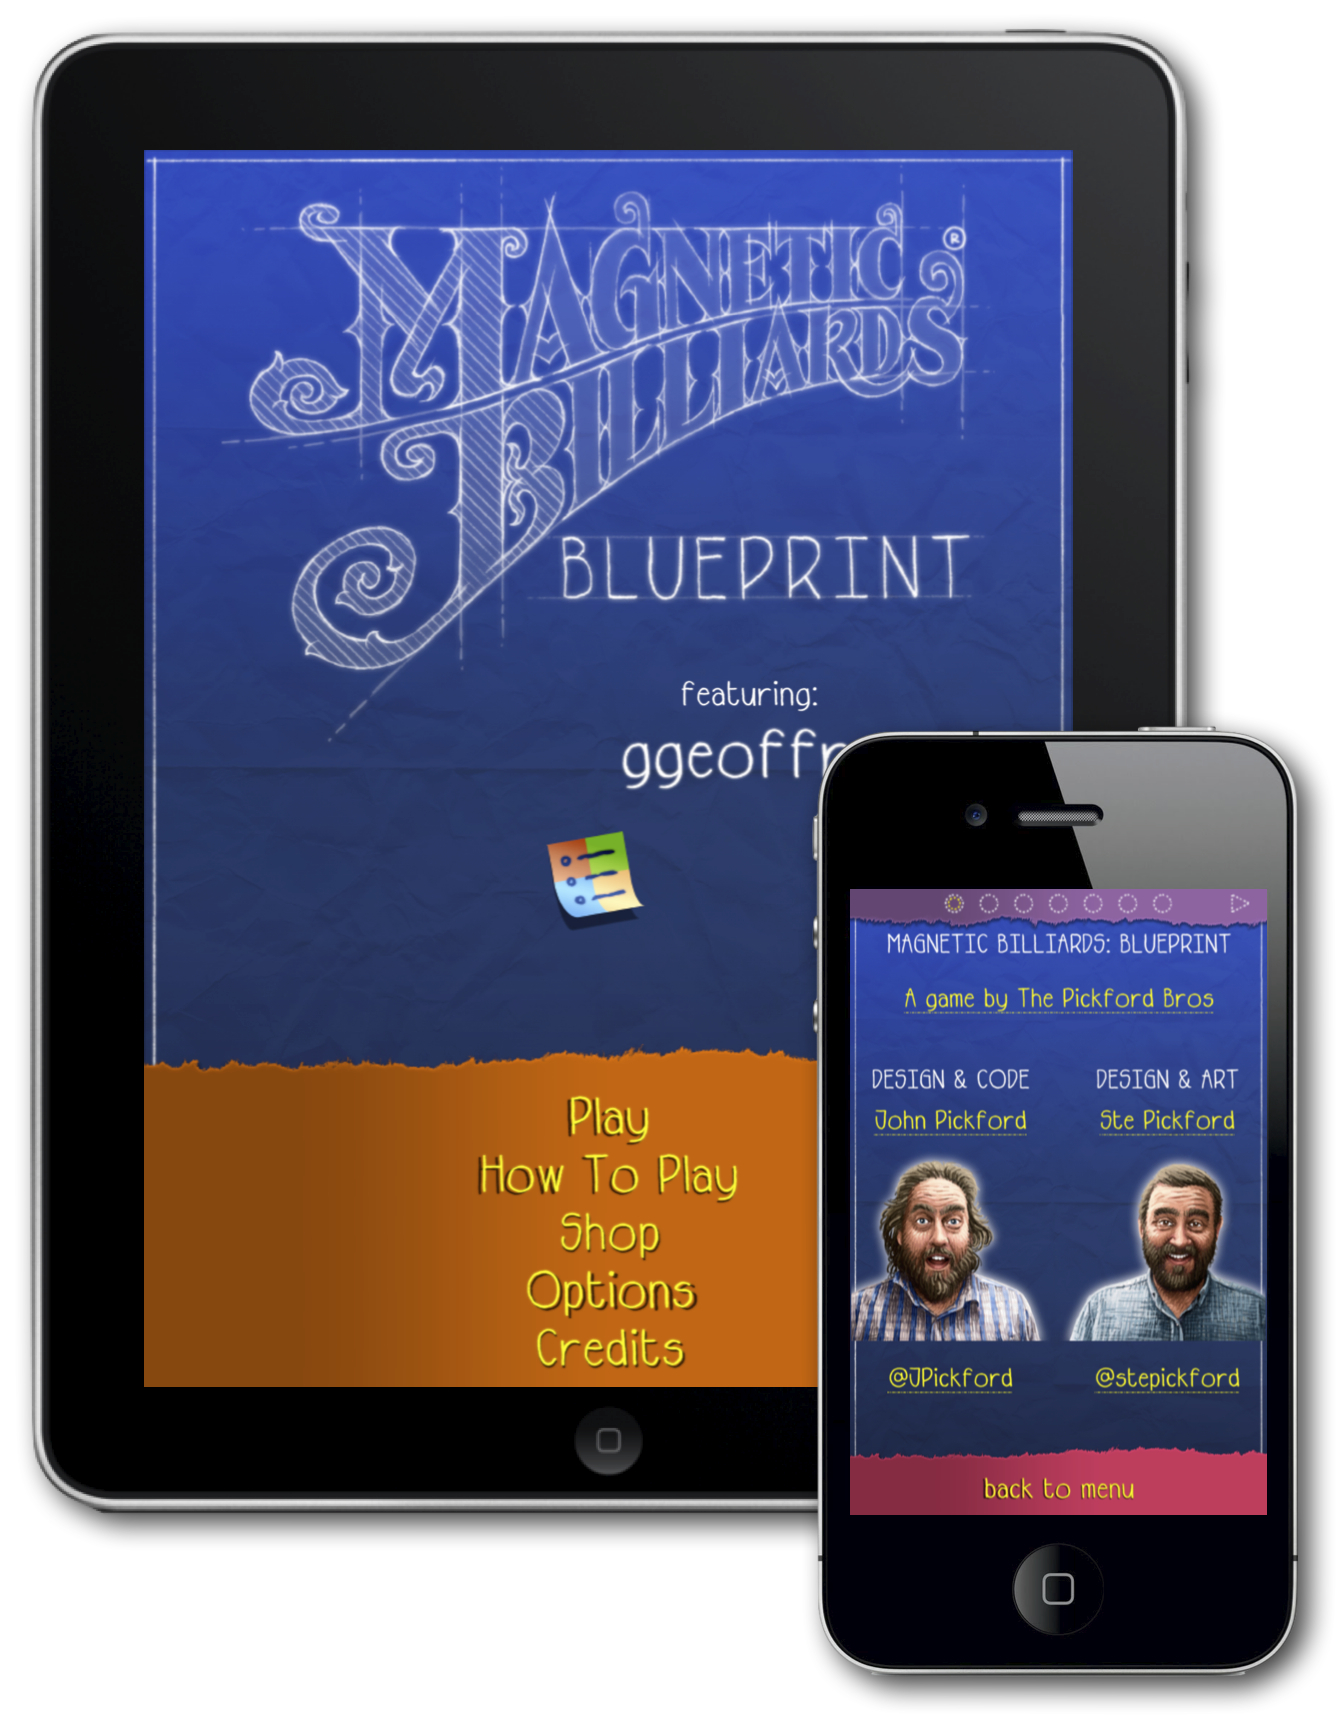 Magnetic Billiards Blueprint